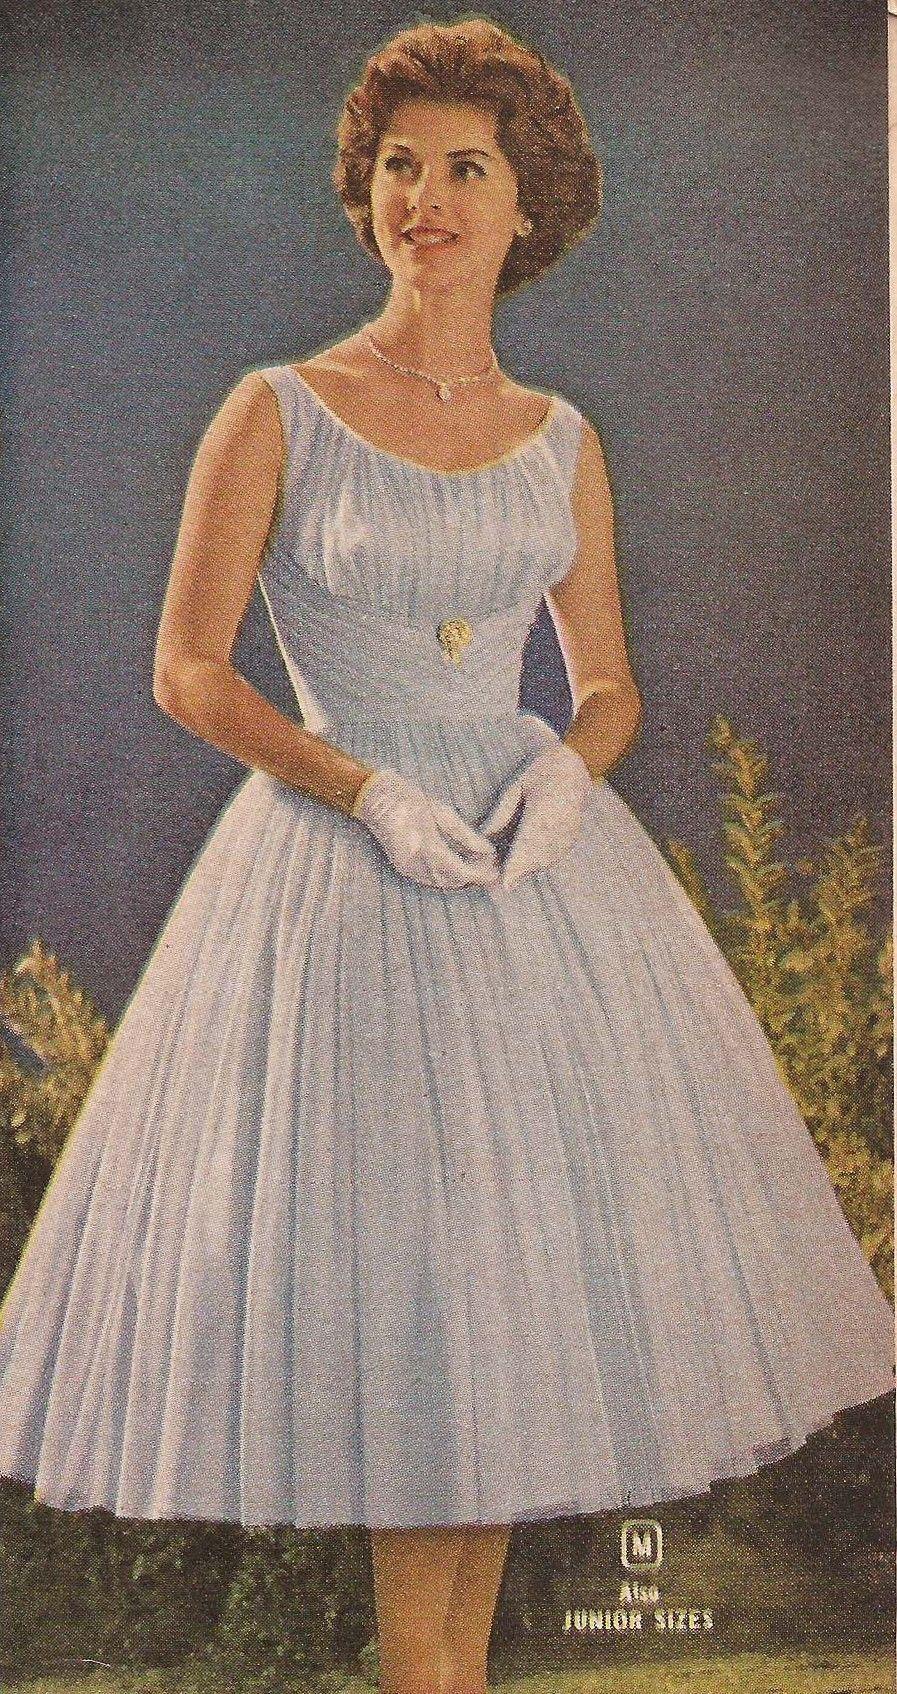 1960 Party Dresses Fifties Fashion Vintage Style Dresses Vintage Outfits [ 1694 x 897 Pixel ]